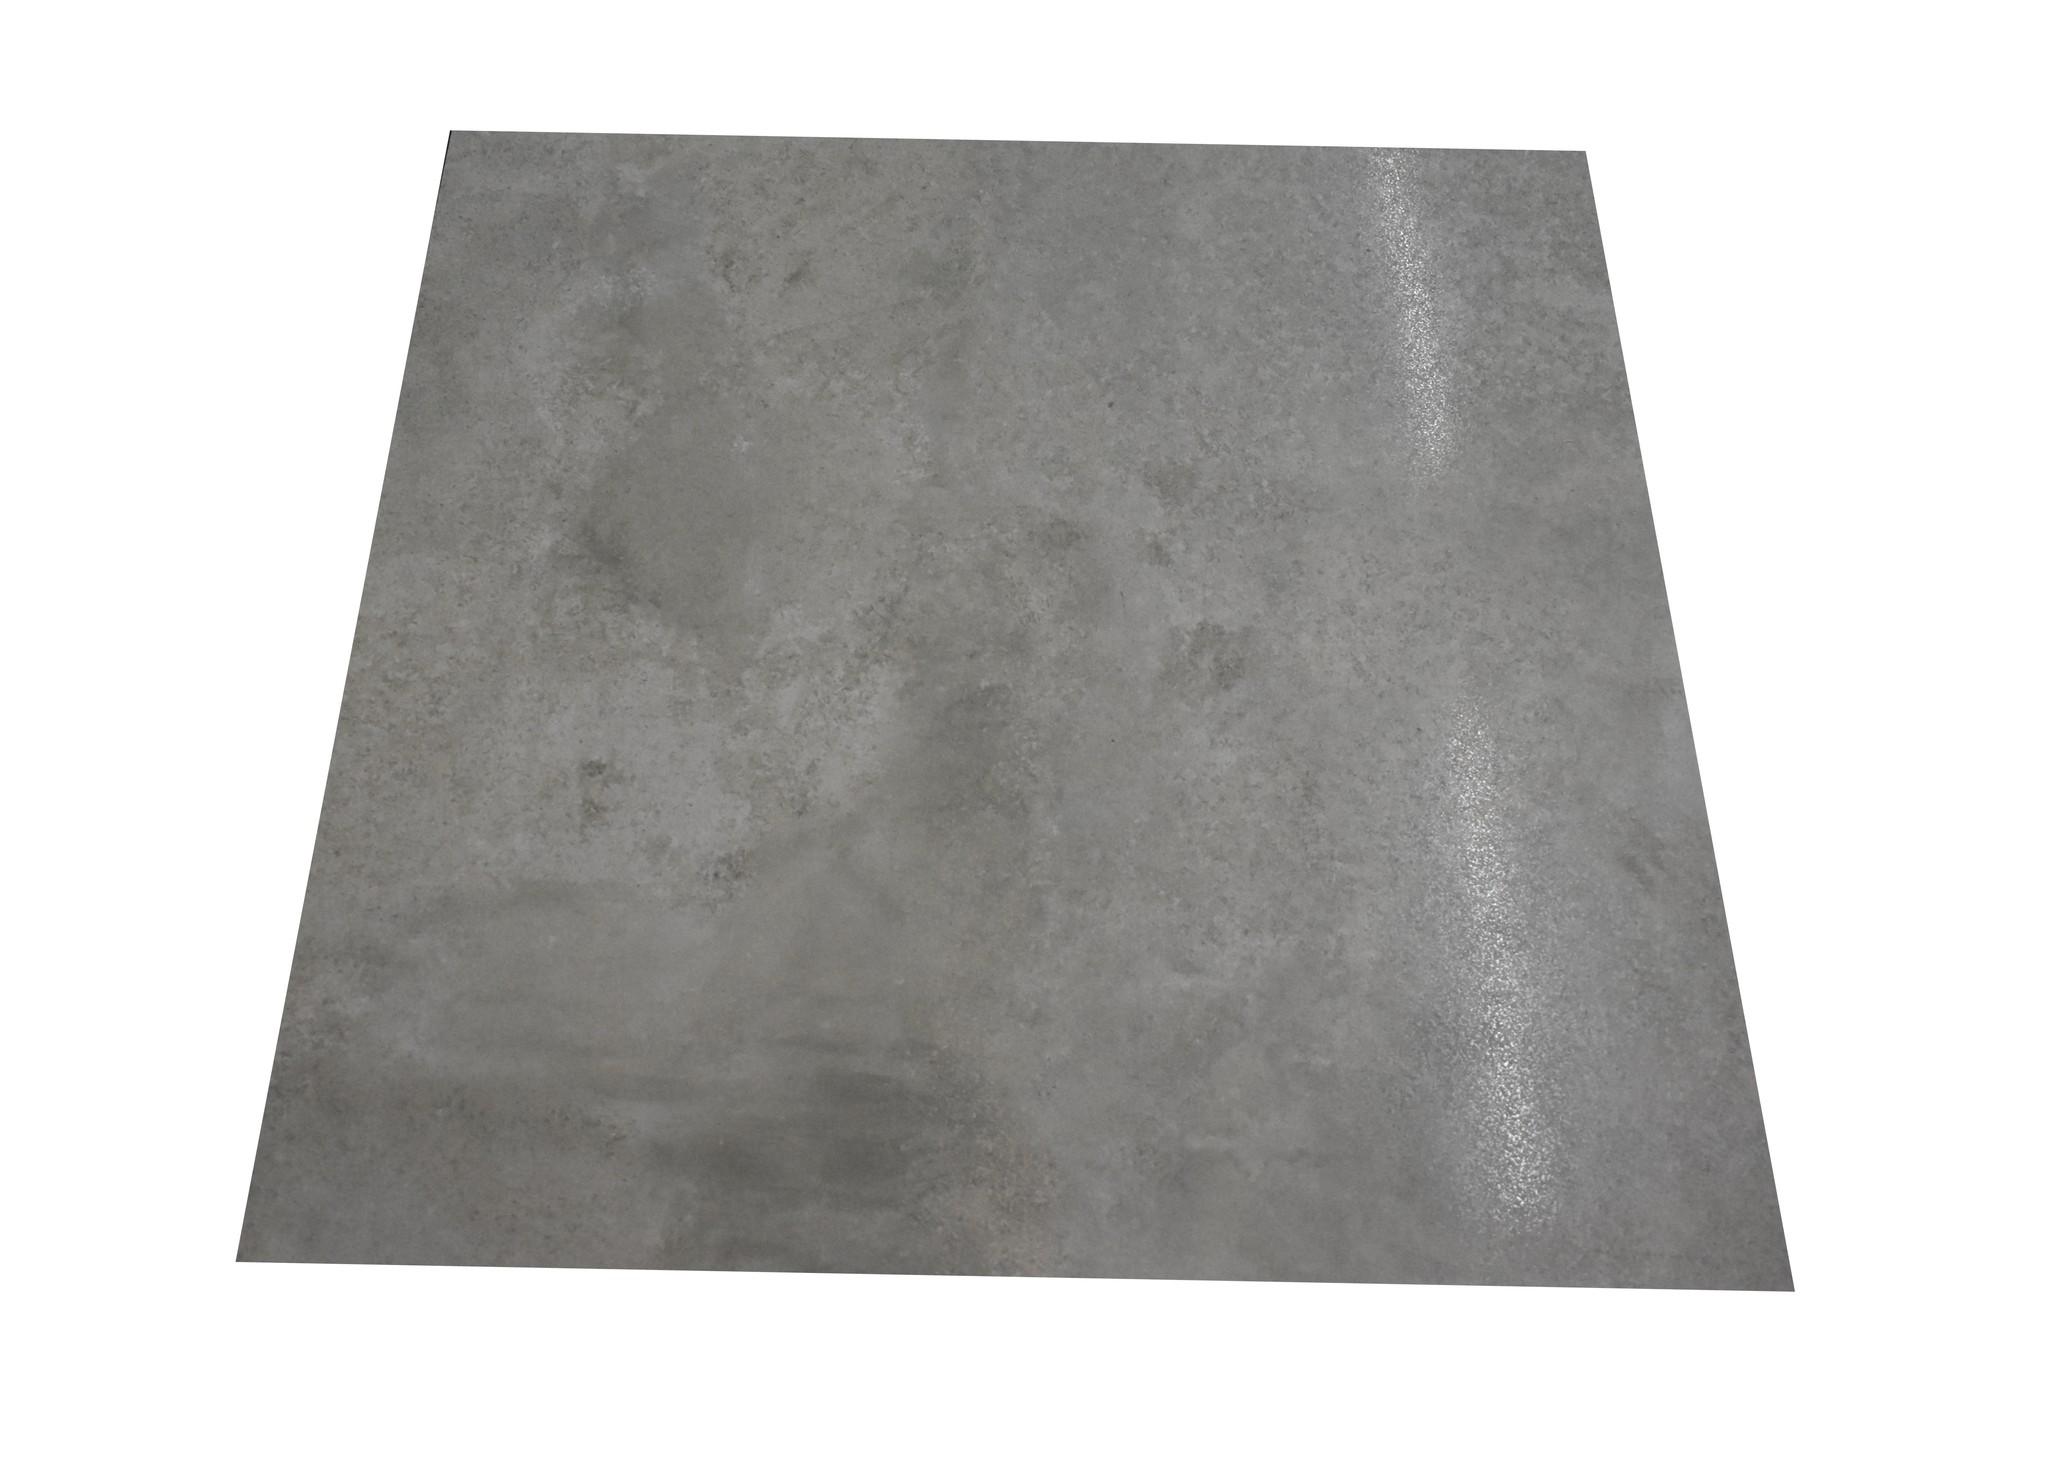 Metallique Perla Płytki podłogowe